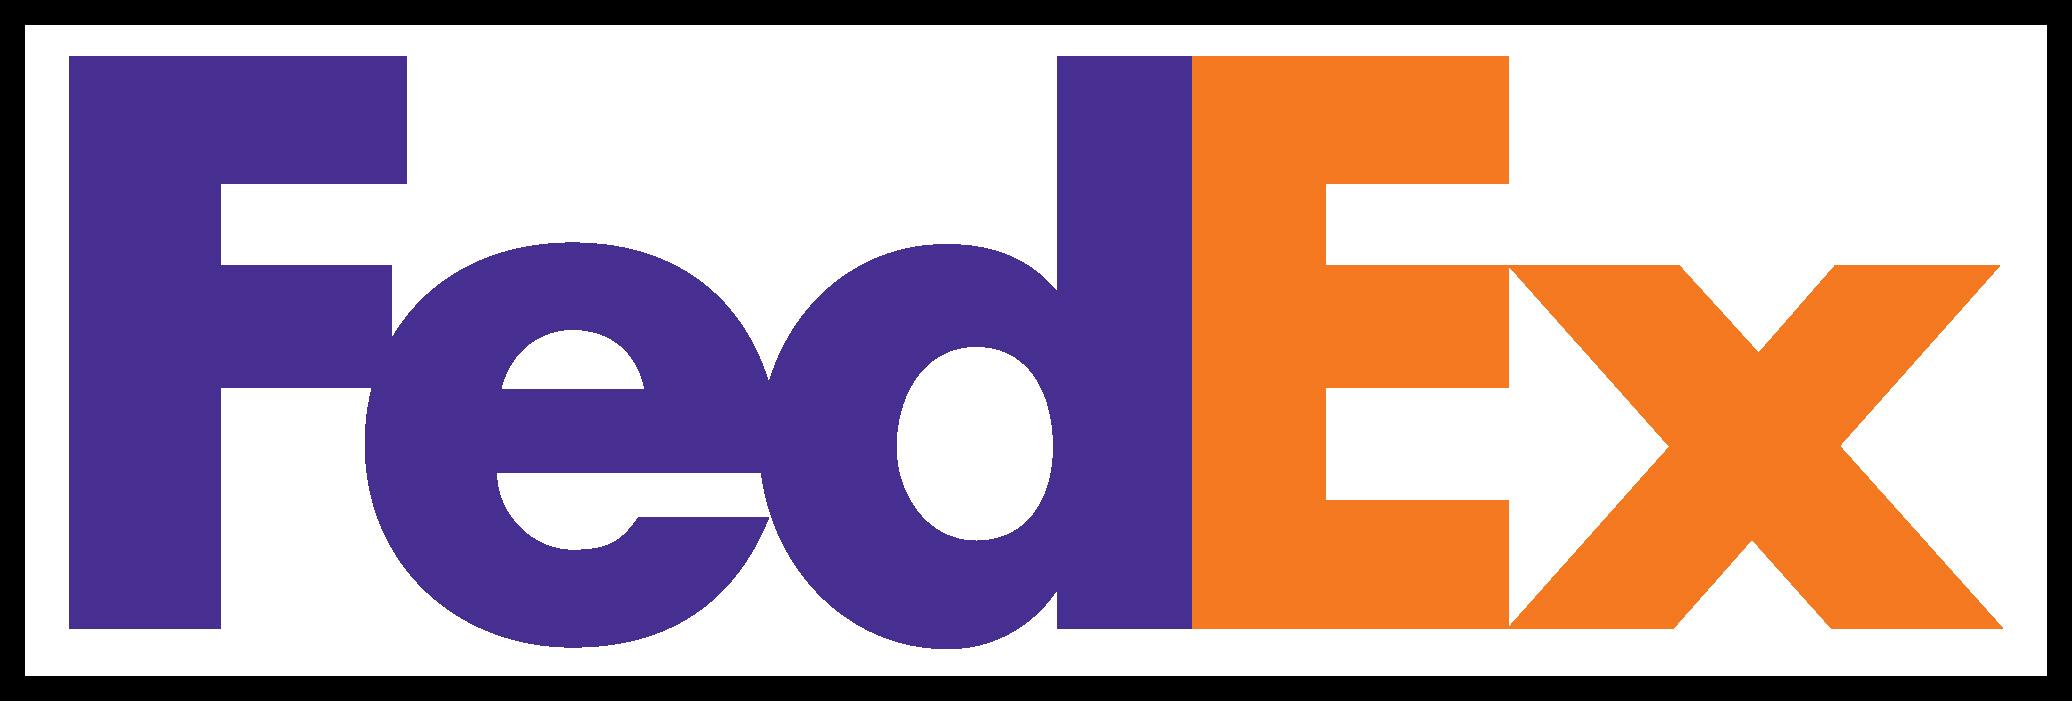 Fedex clipart (35+) Art logo Clip Fedex